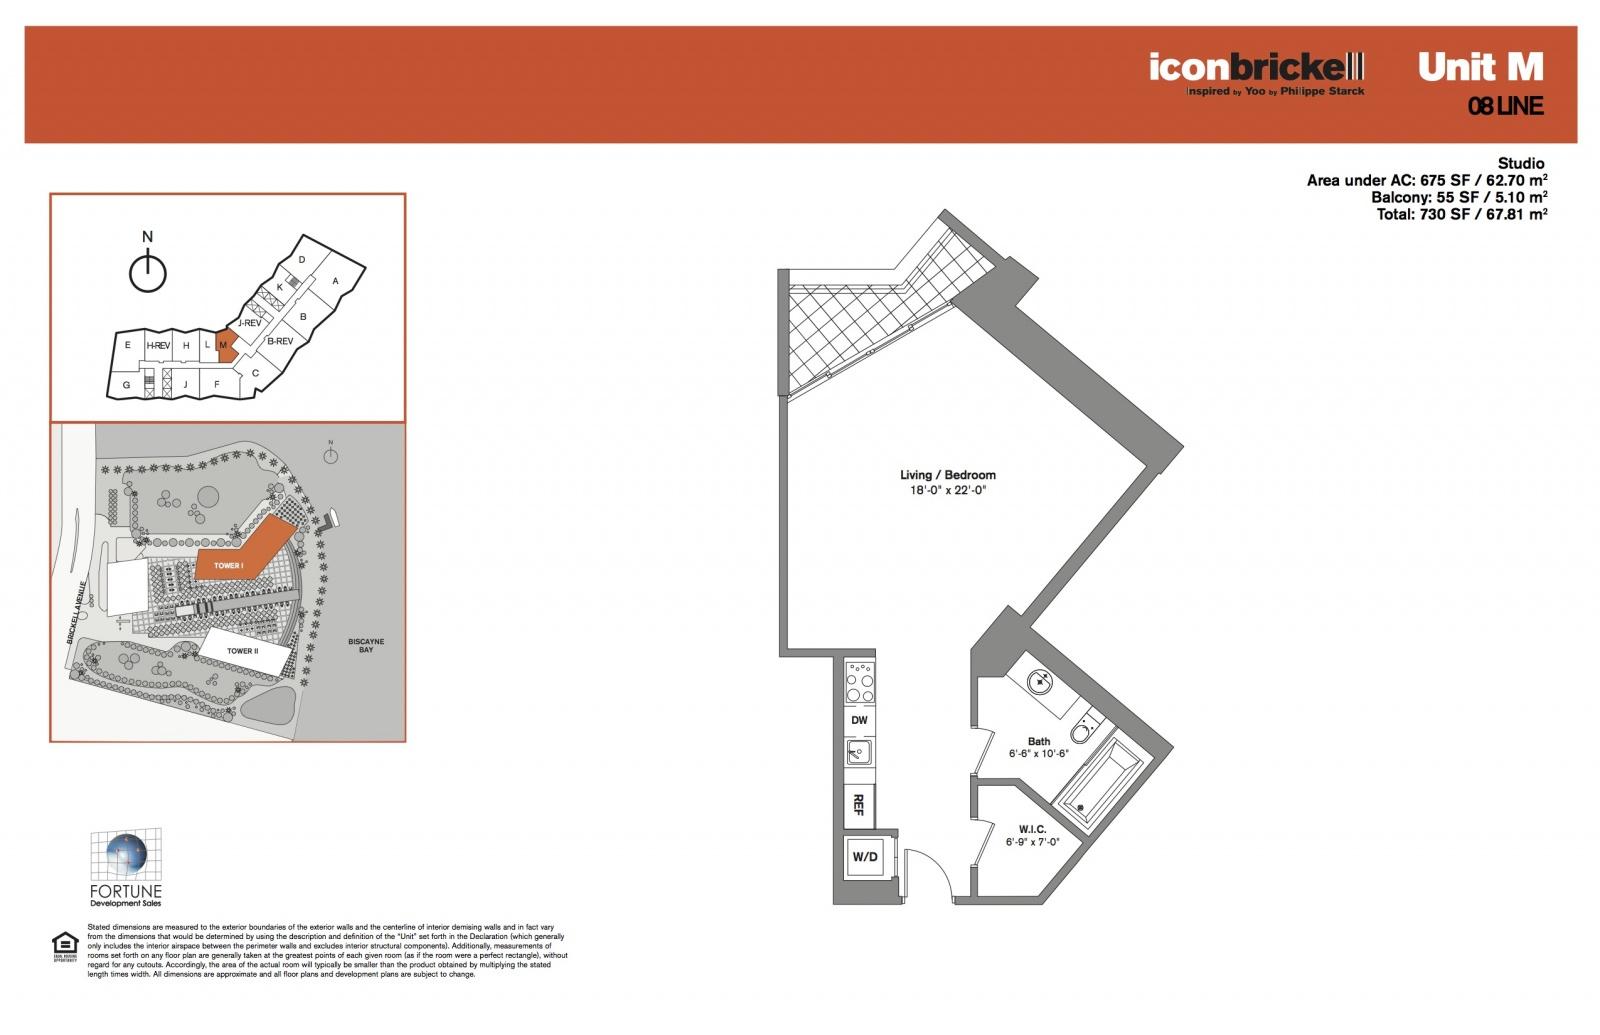 Icon Brickell One, line 08 floor plan